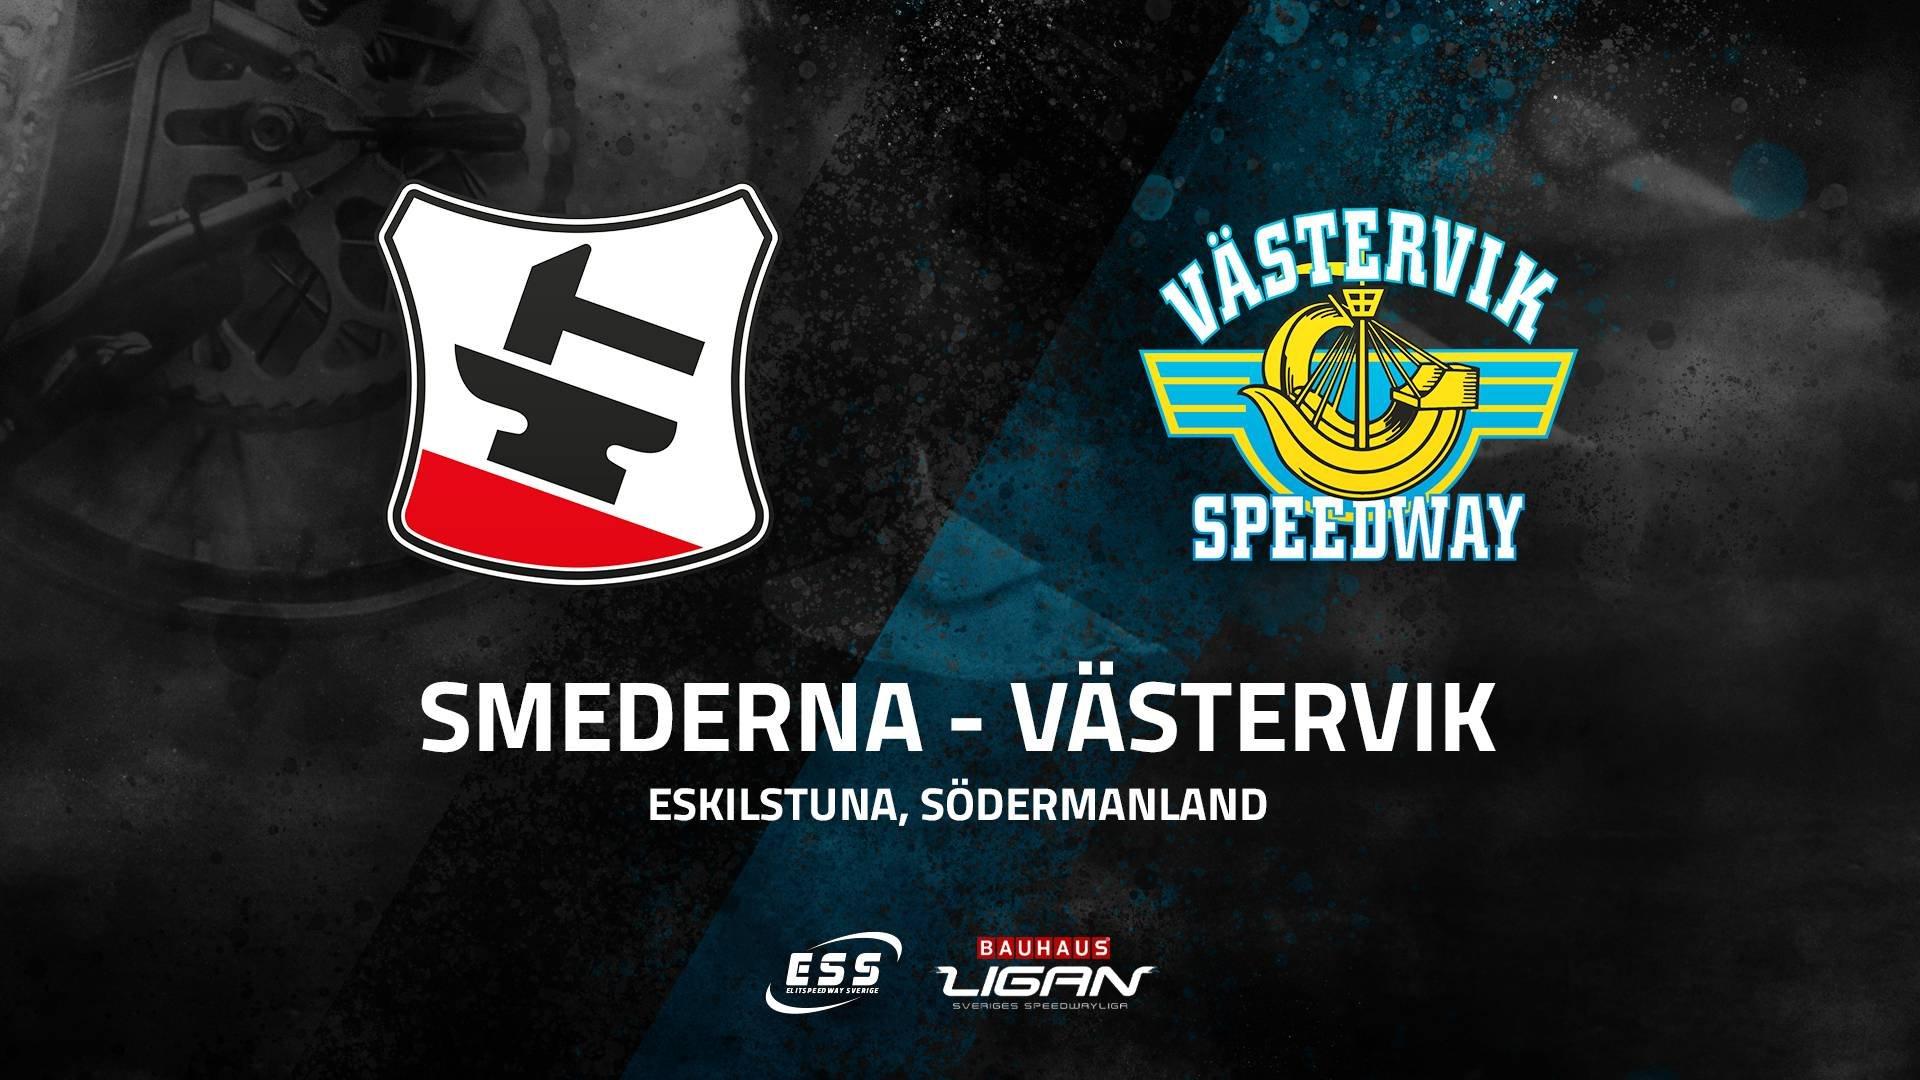 Smederna - Västervik